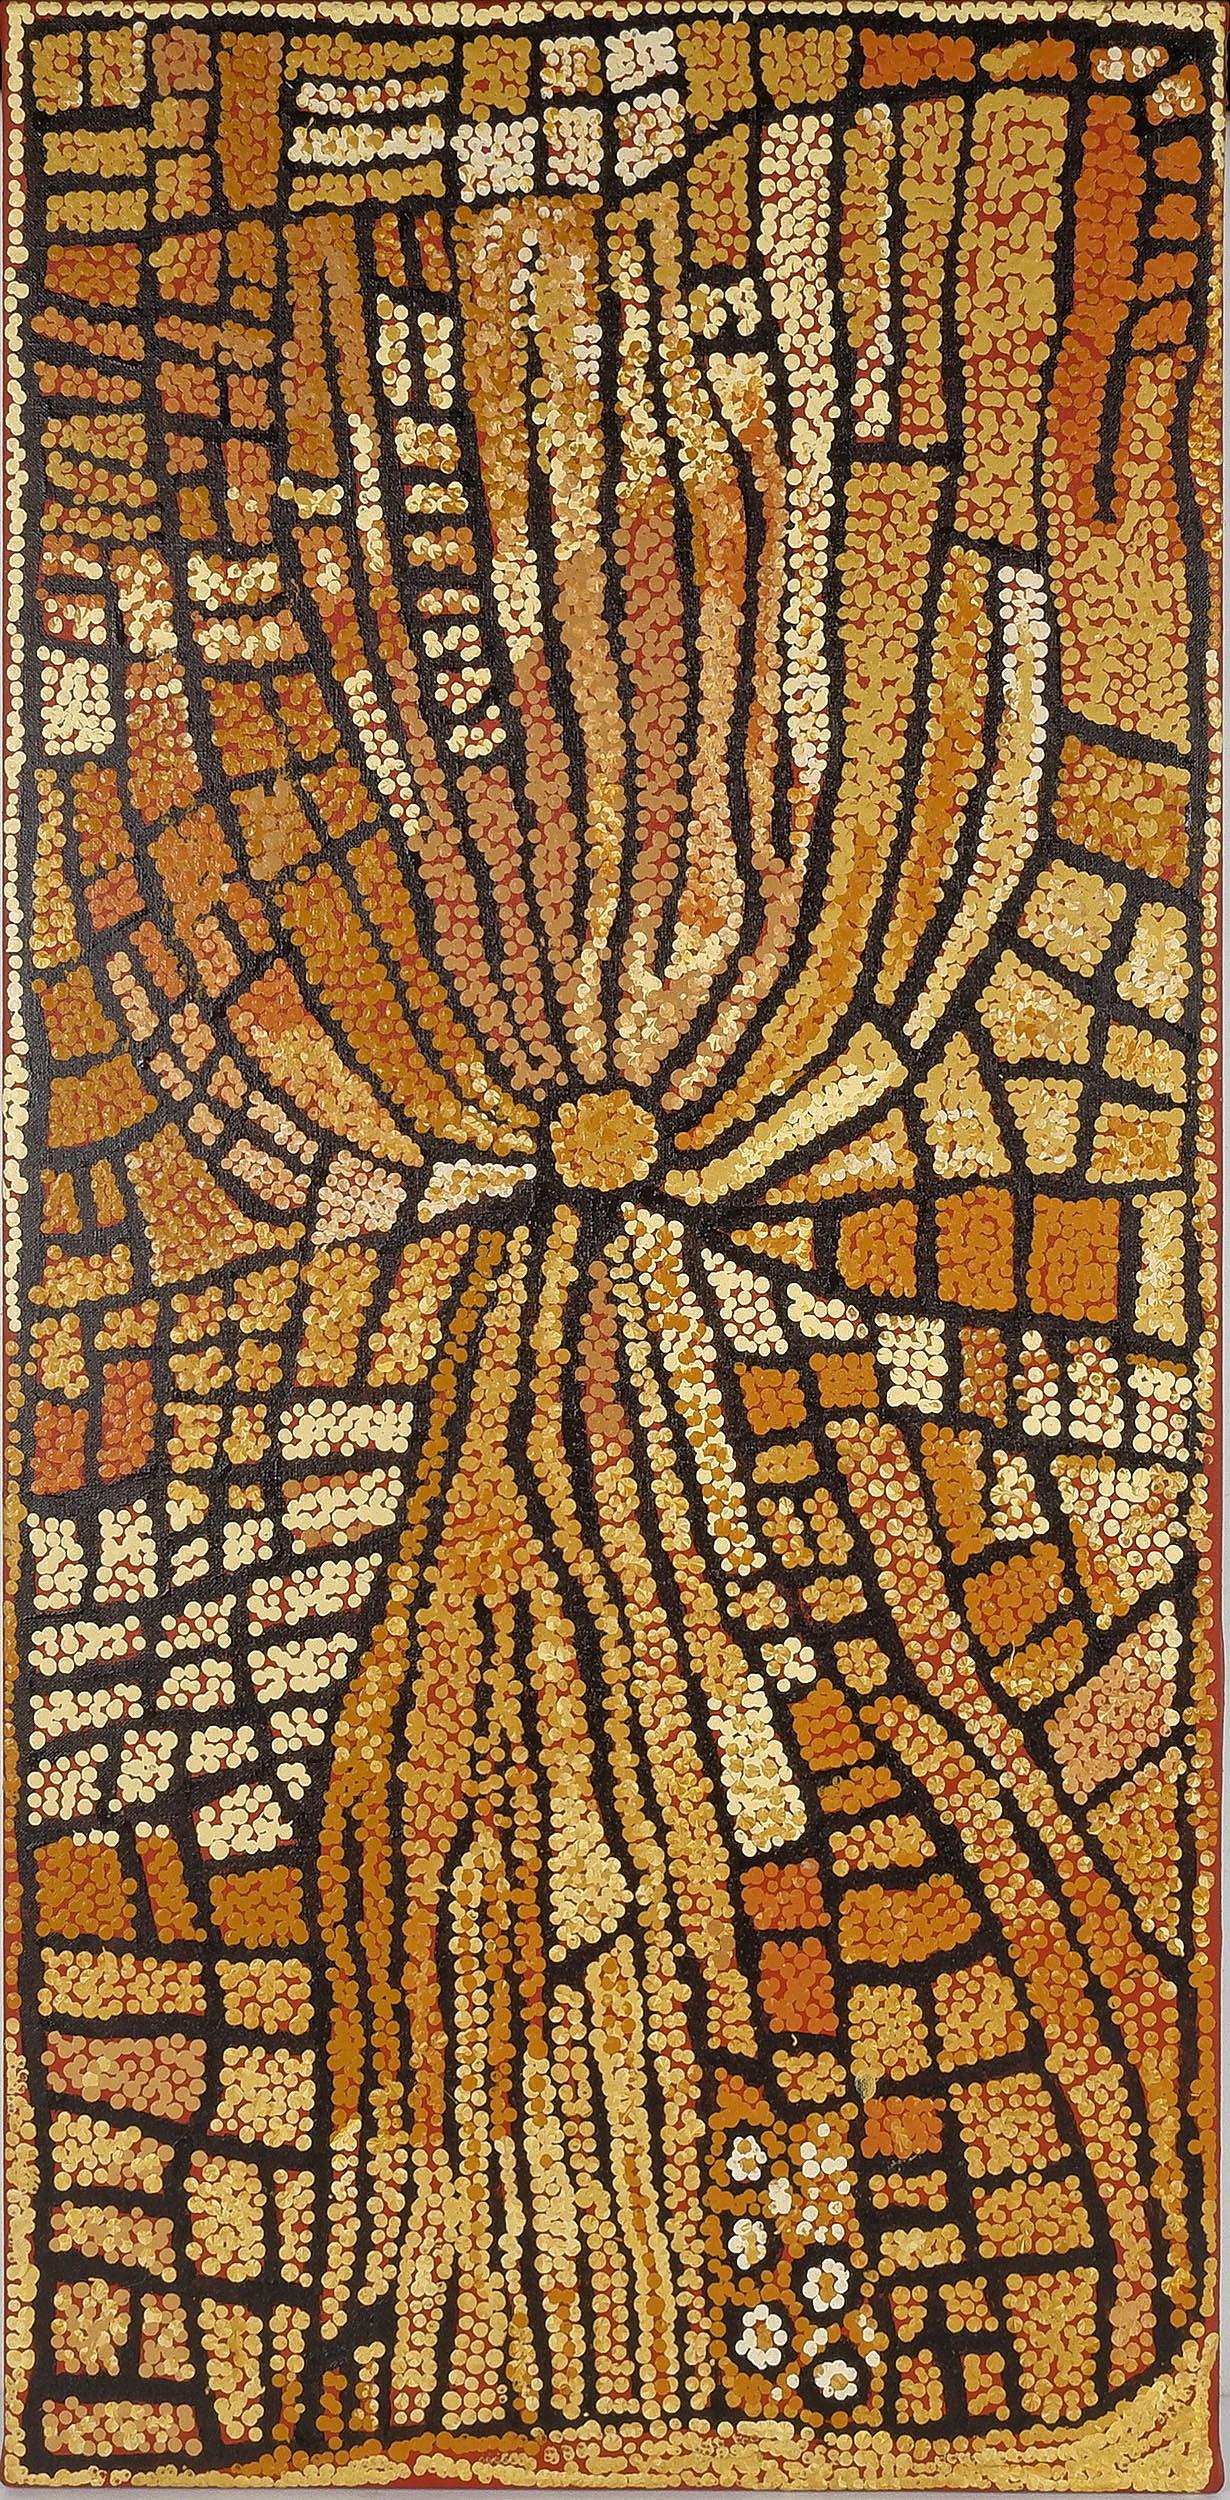 'Naata Nungurrayi (Pintupi c.1932-) Untitled 2004, Acrylic on Linen'